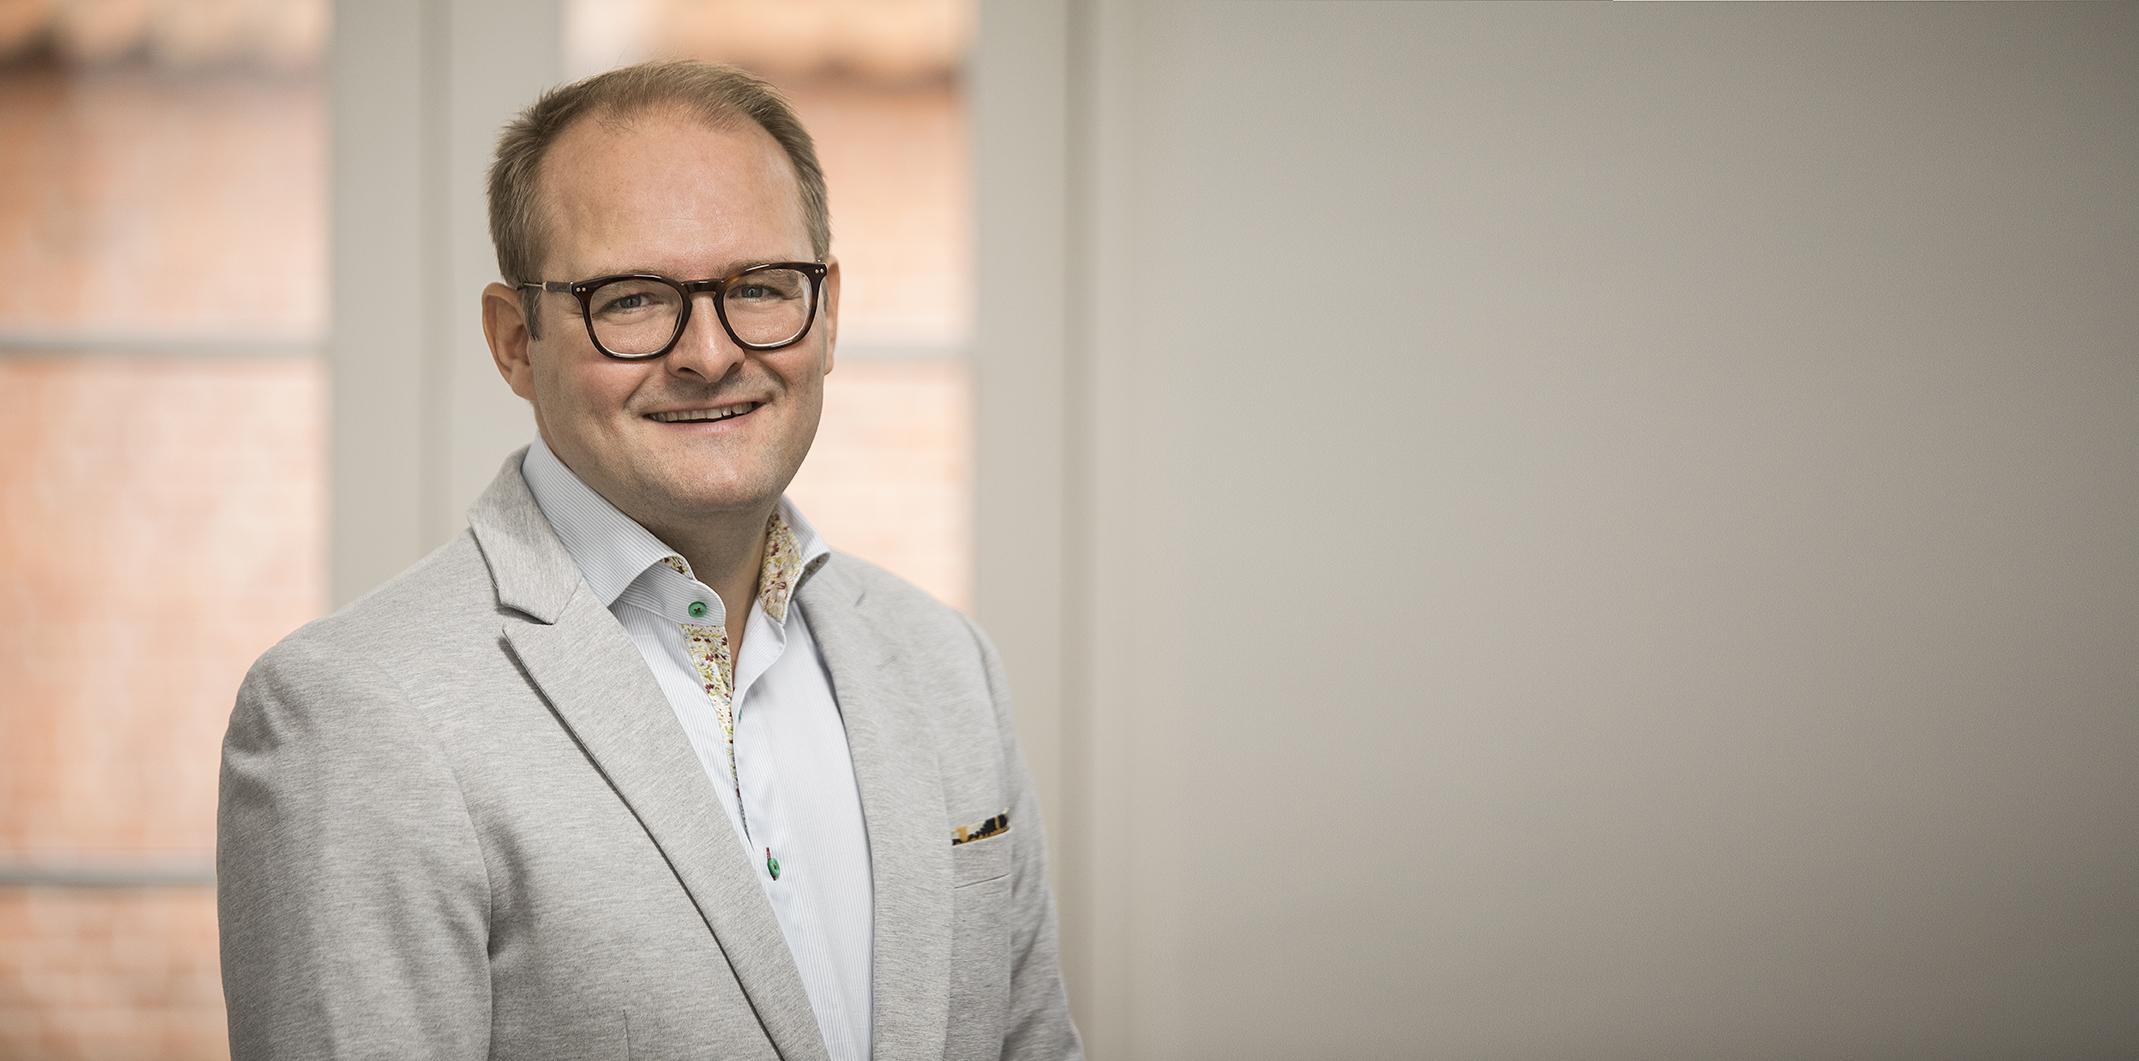 Jerry Porsborg - Digital Marketing